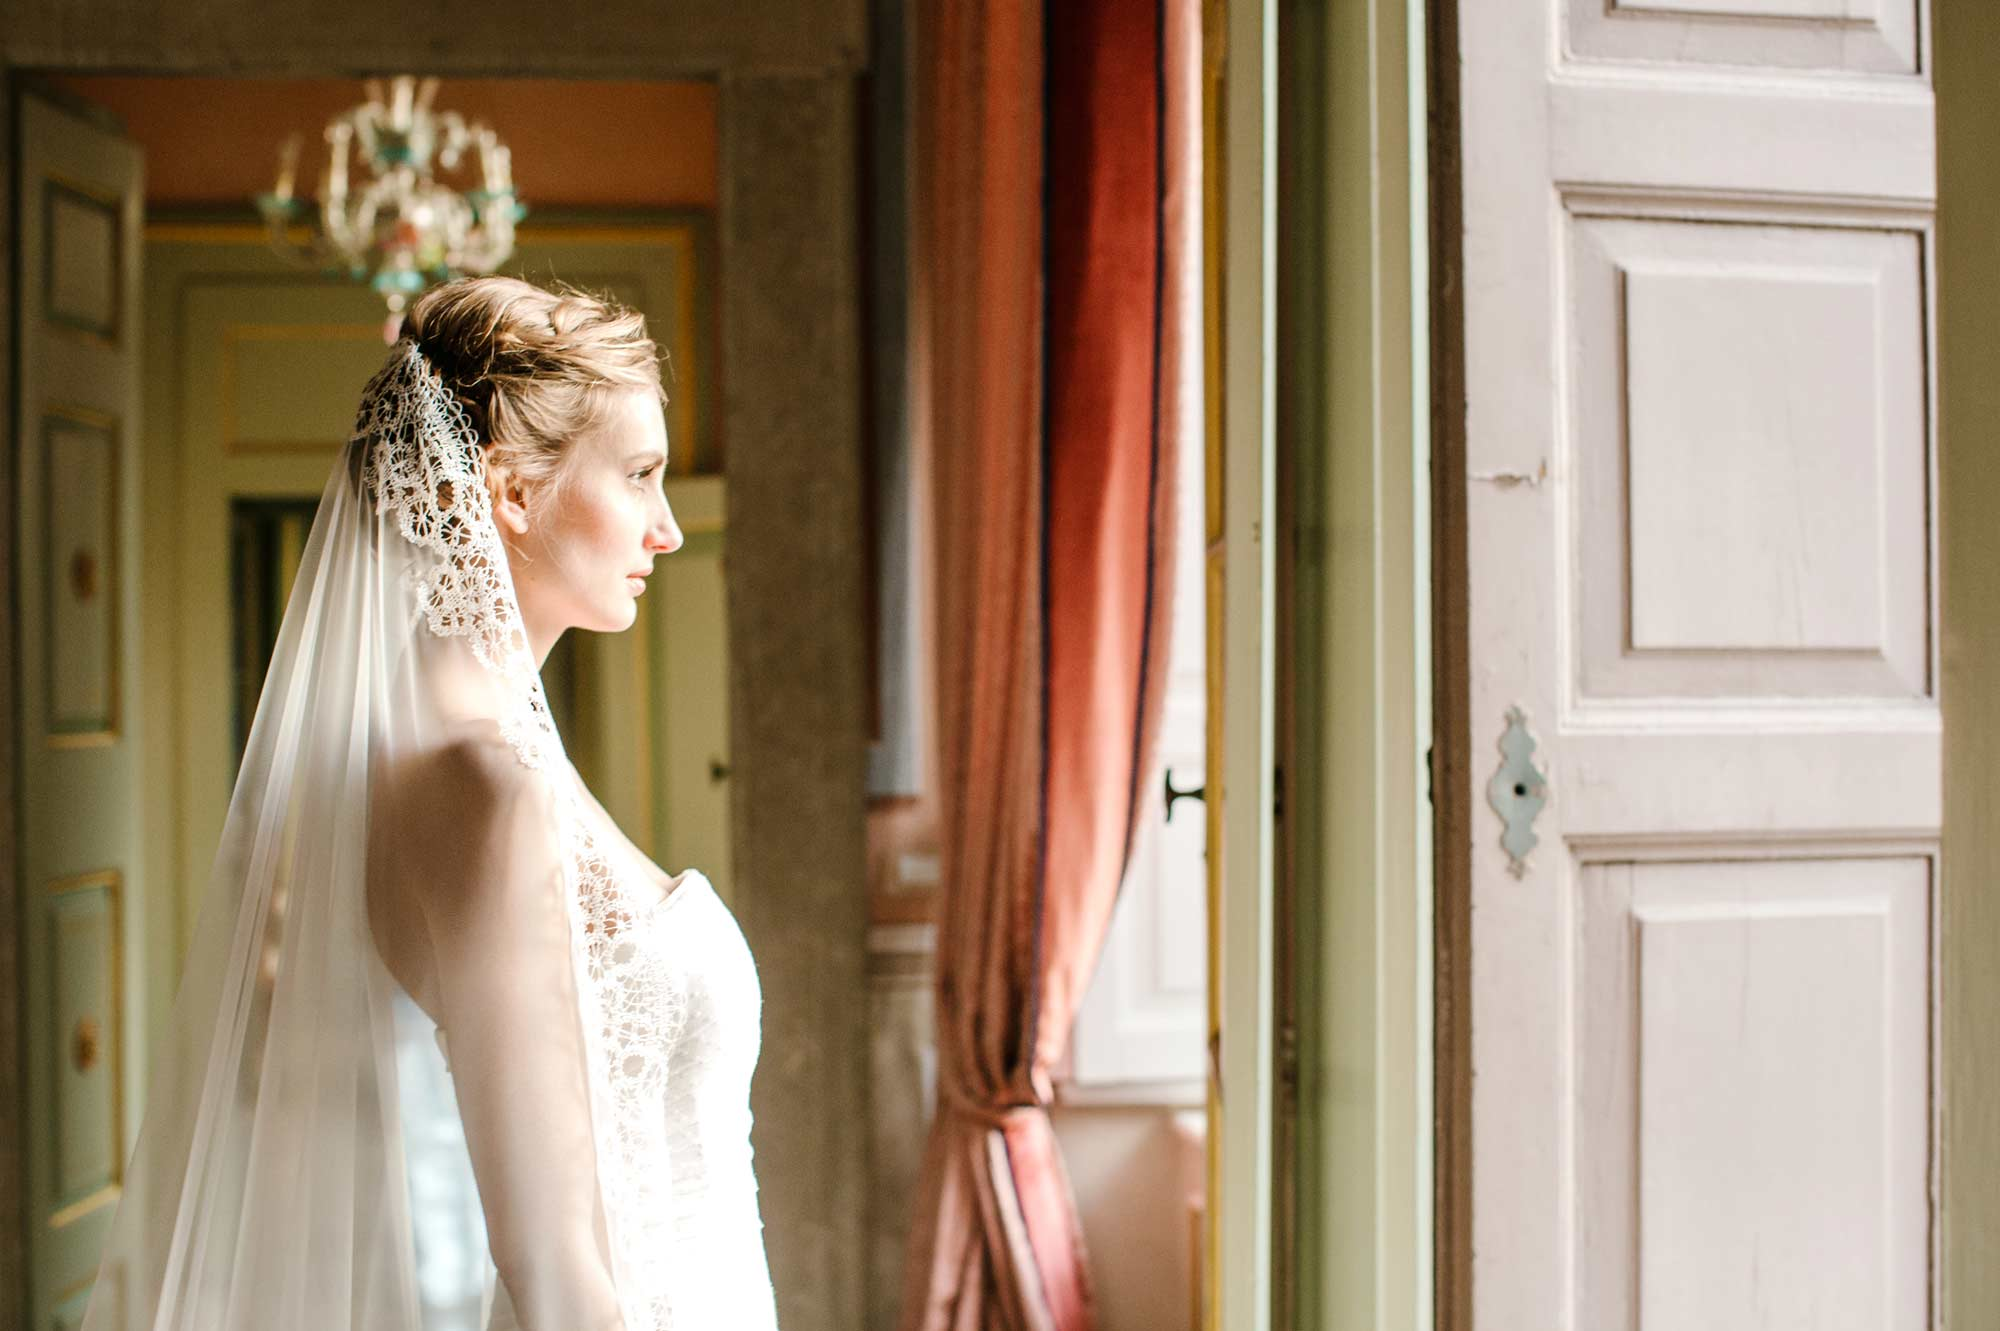 bellissimo velo sposa, velo sposa lungo, couture hayez veli sposa